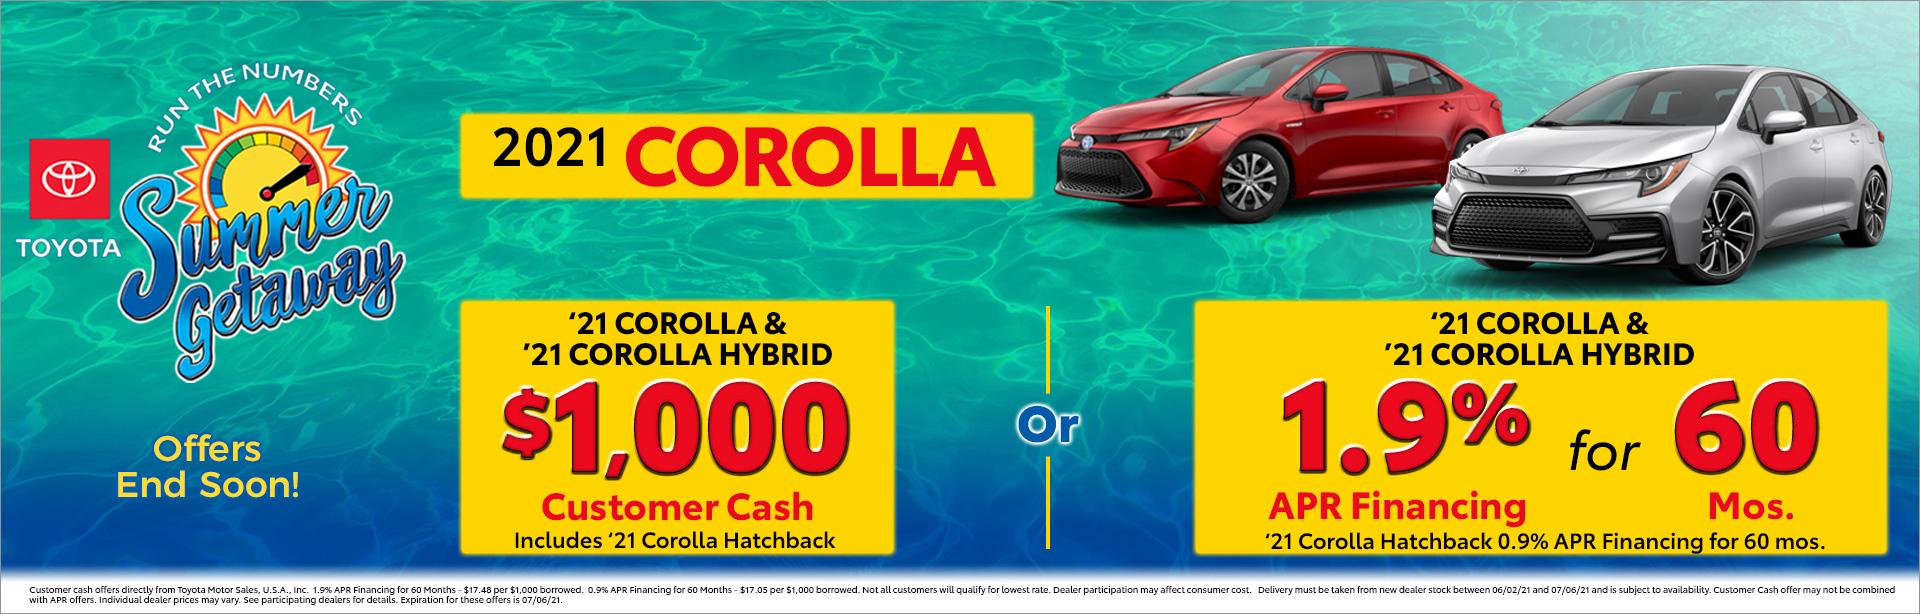 06-21_01_Cincinnati-June-2021-CIN-Summer-Getaway-Corolla_1920x614_703d_Corolla-Corolla-Hybrid_O_xta.jpeg